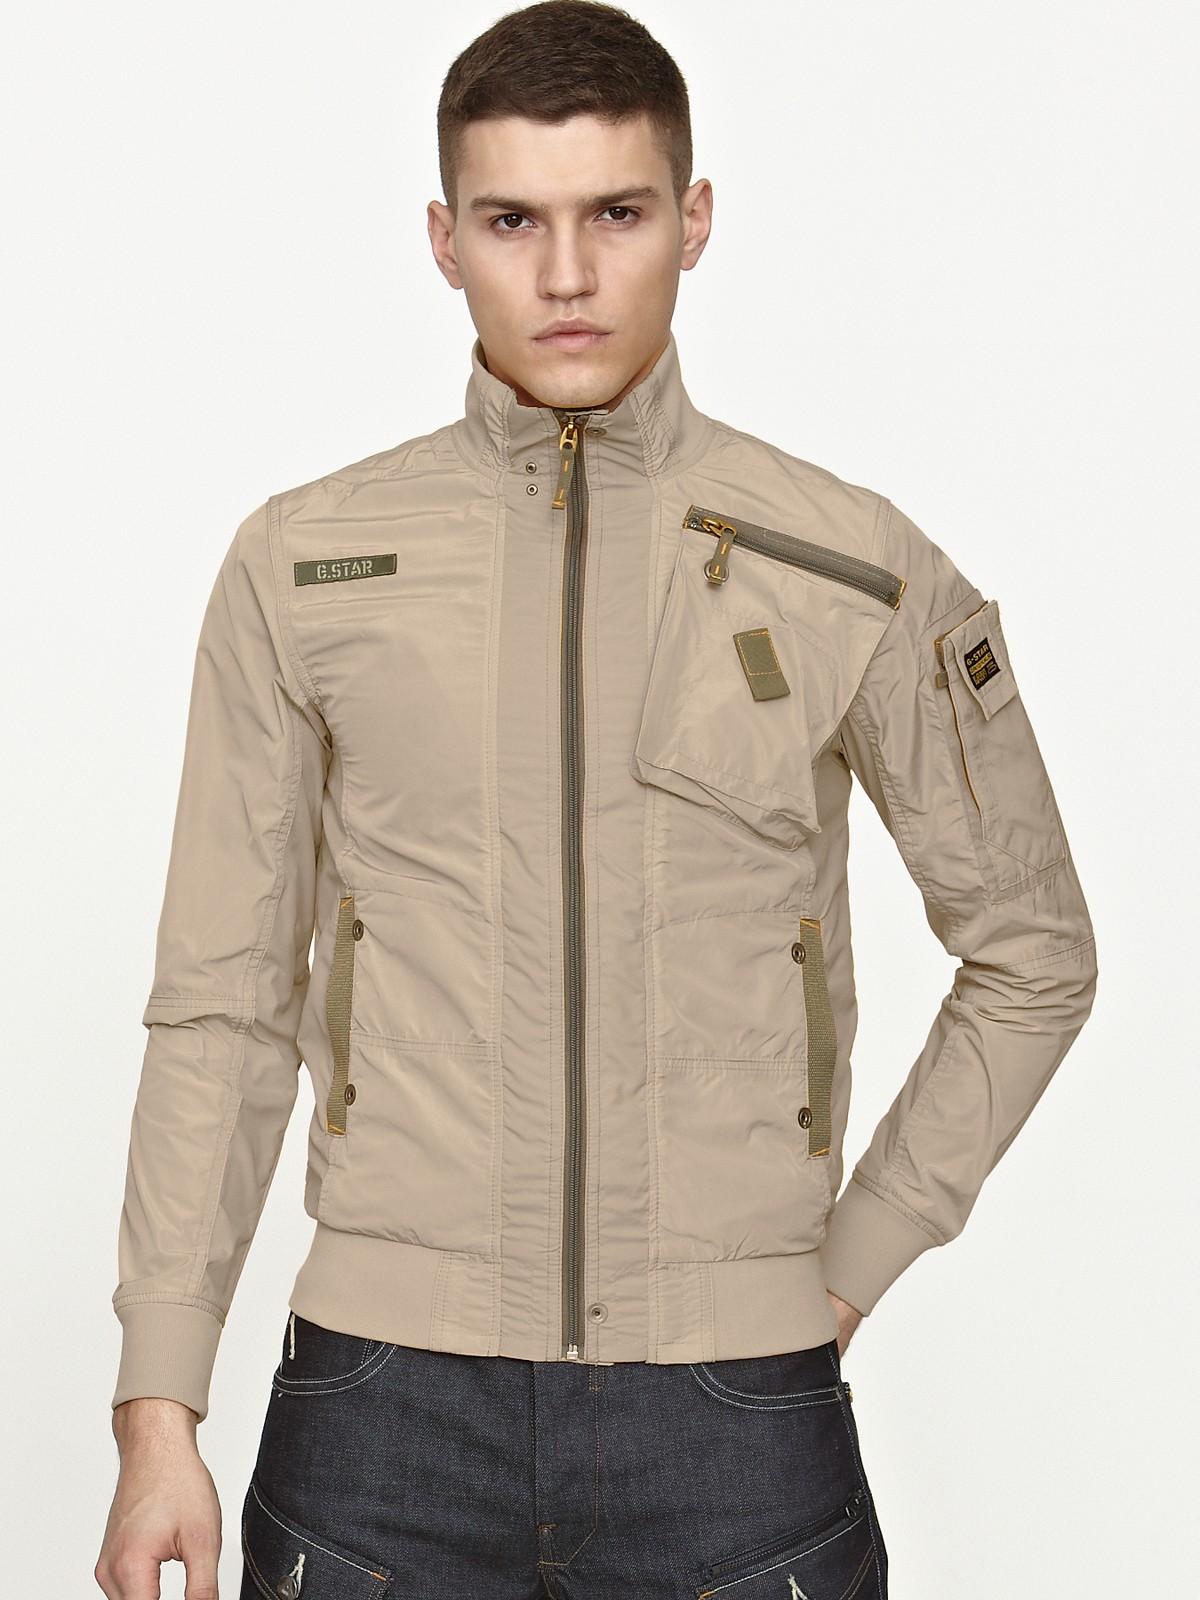 g star raw gstar raw mens blouson jacket in beige for men. Black Bedroom Furniture Sets. Home Design Ideas